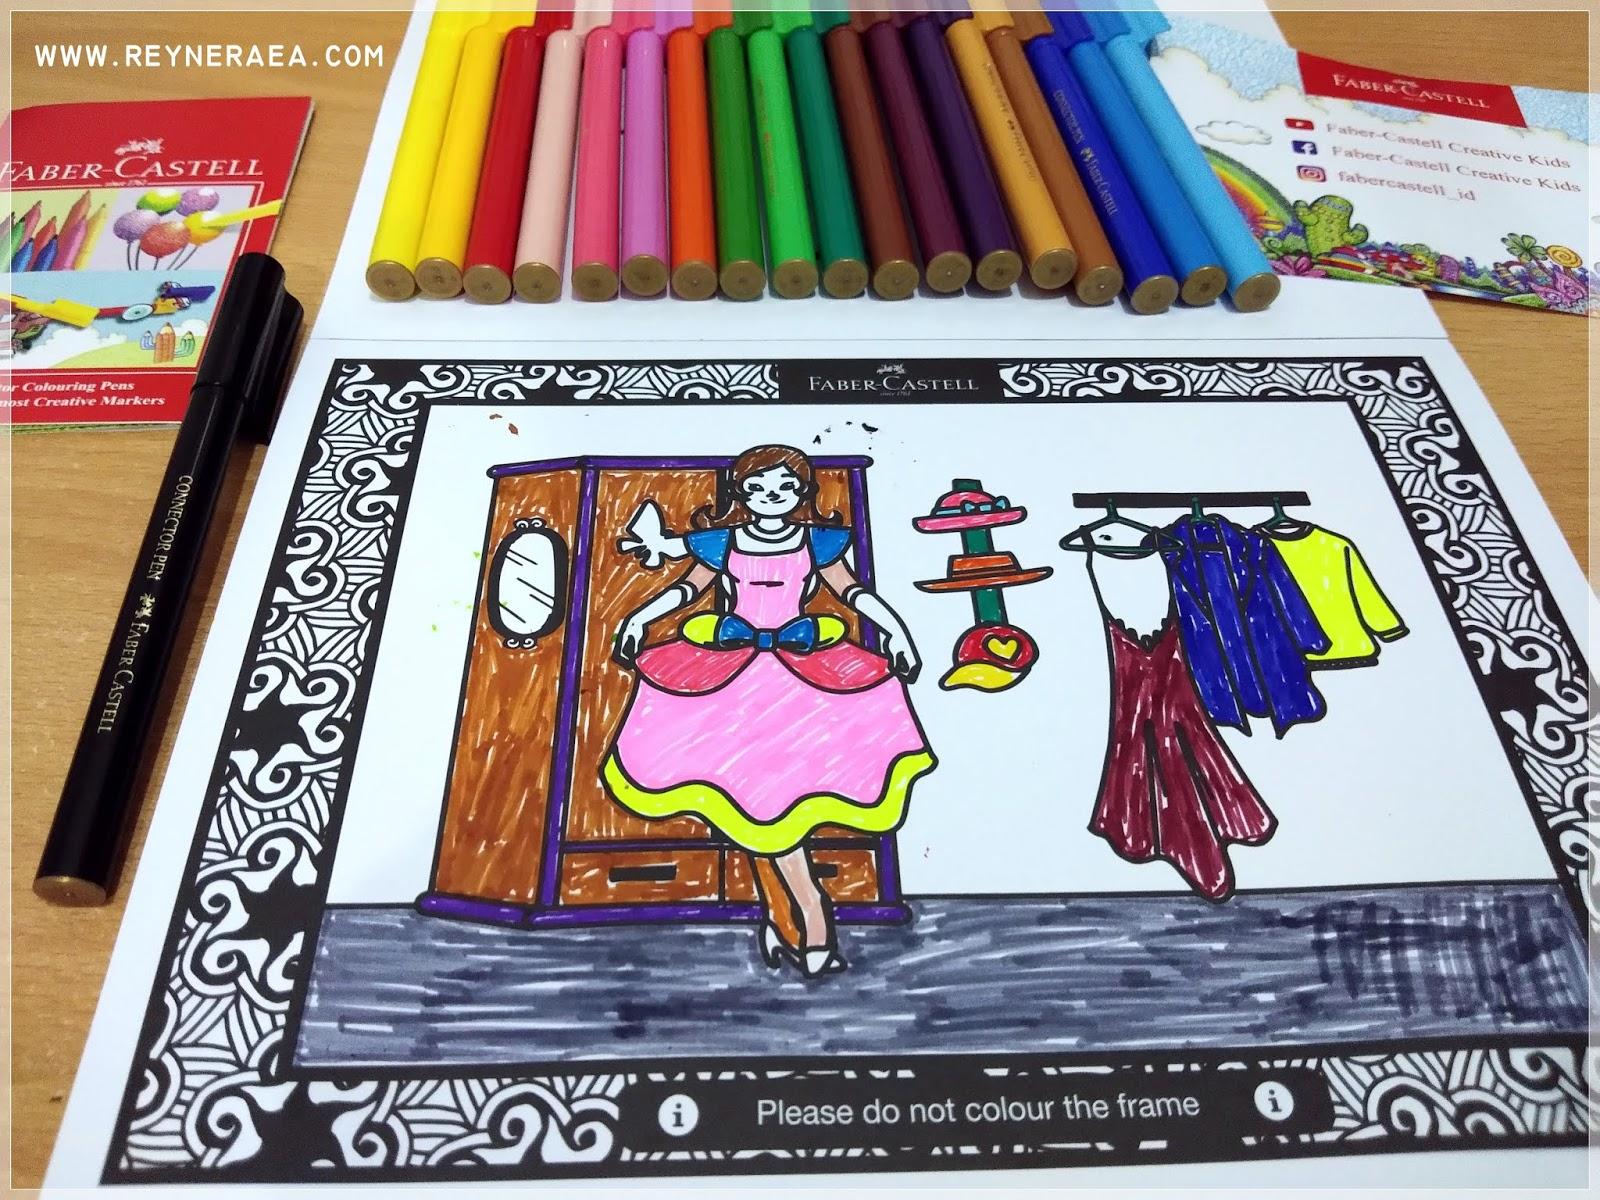 All About Woman Quality Time Bersama Anak Dengan Colour To Life Faber Castell Setelah Gambar Diwarnai Sempurna Ambil Gadget Lalu Install Aplikasi Cara